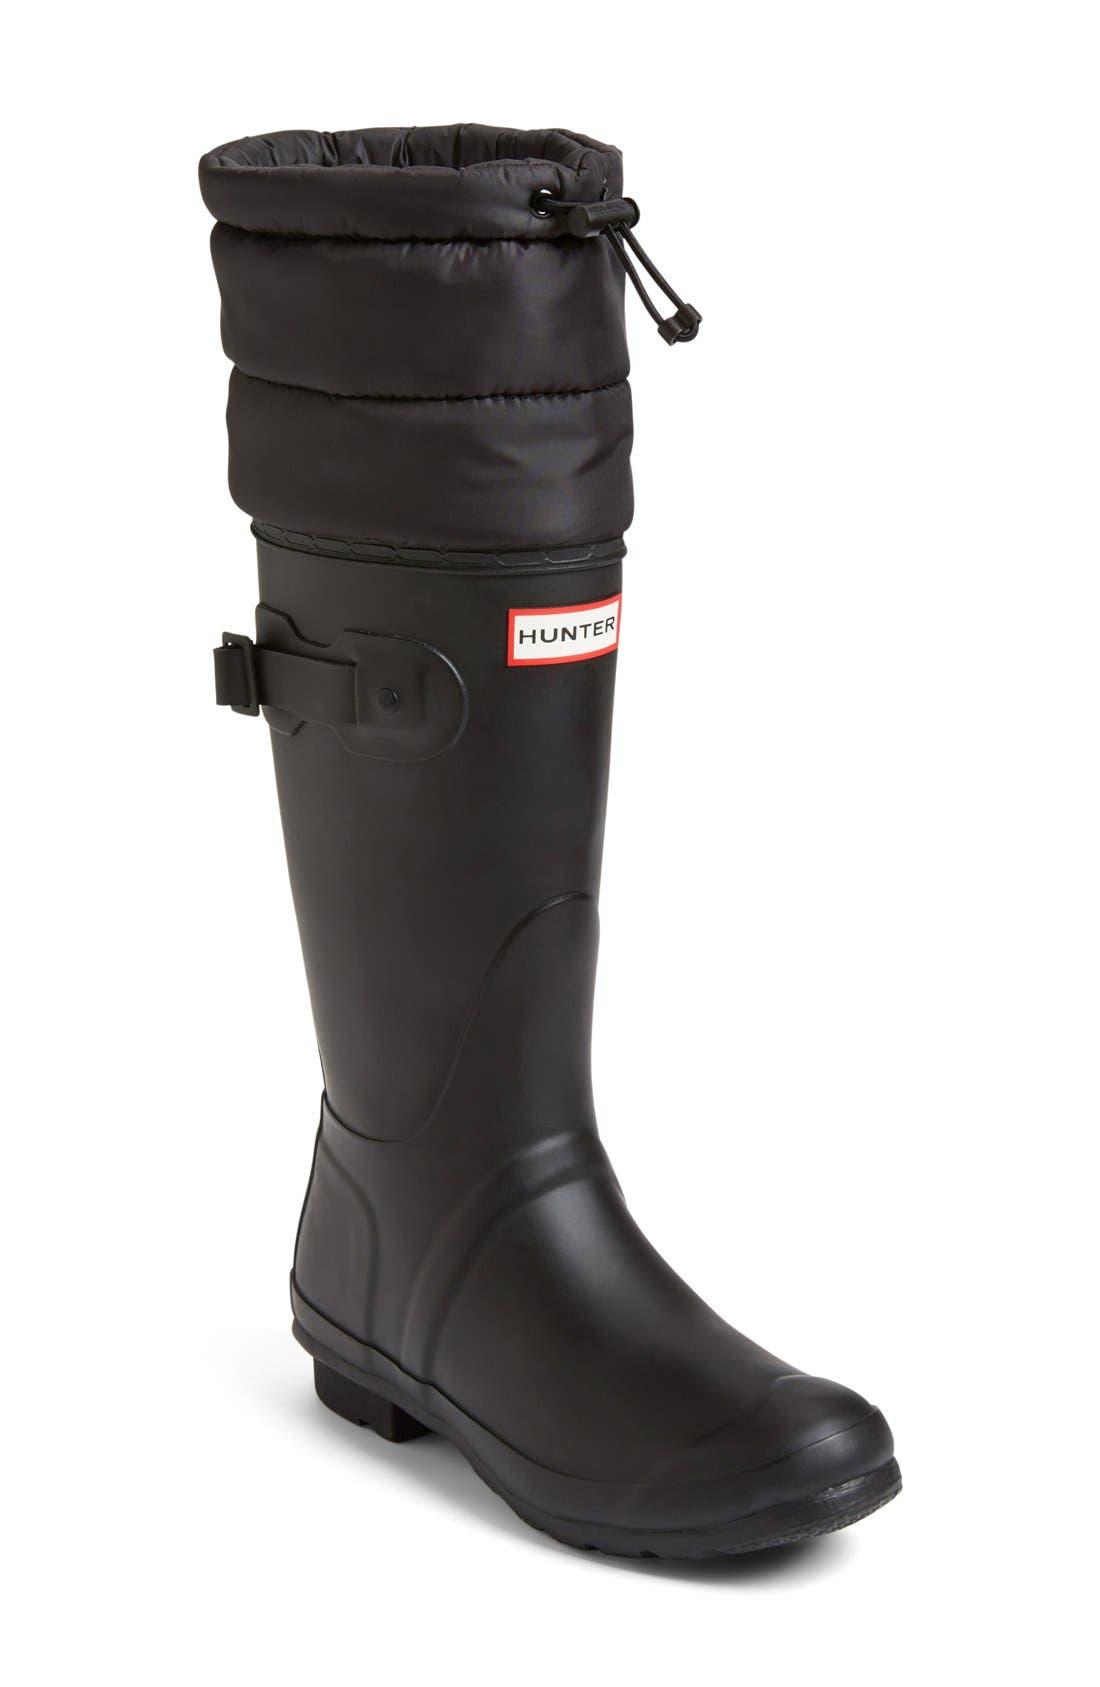 Alternate Image 1 Selected - Hunter 'Original - Quilted Cuff' Rain Boot (Women)